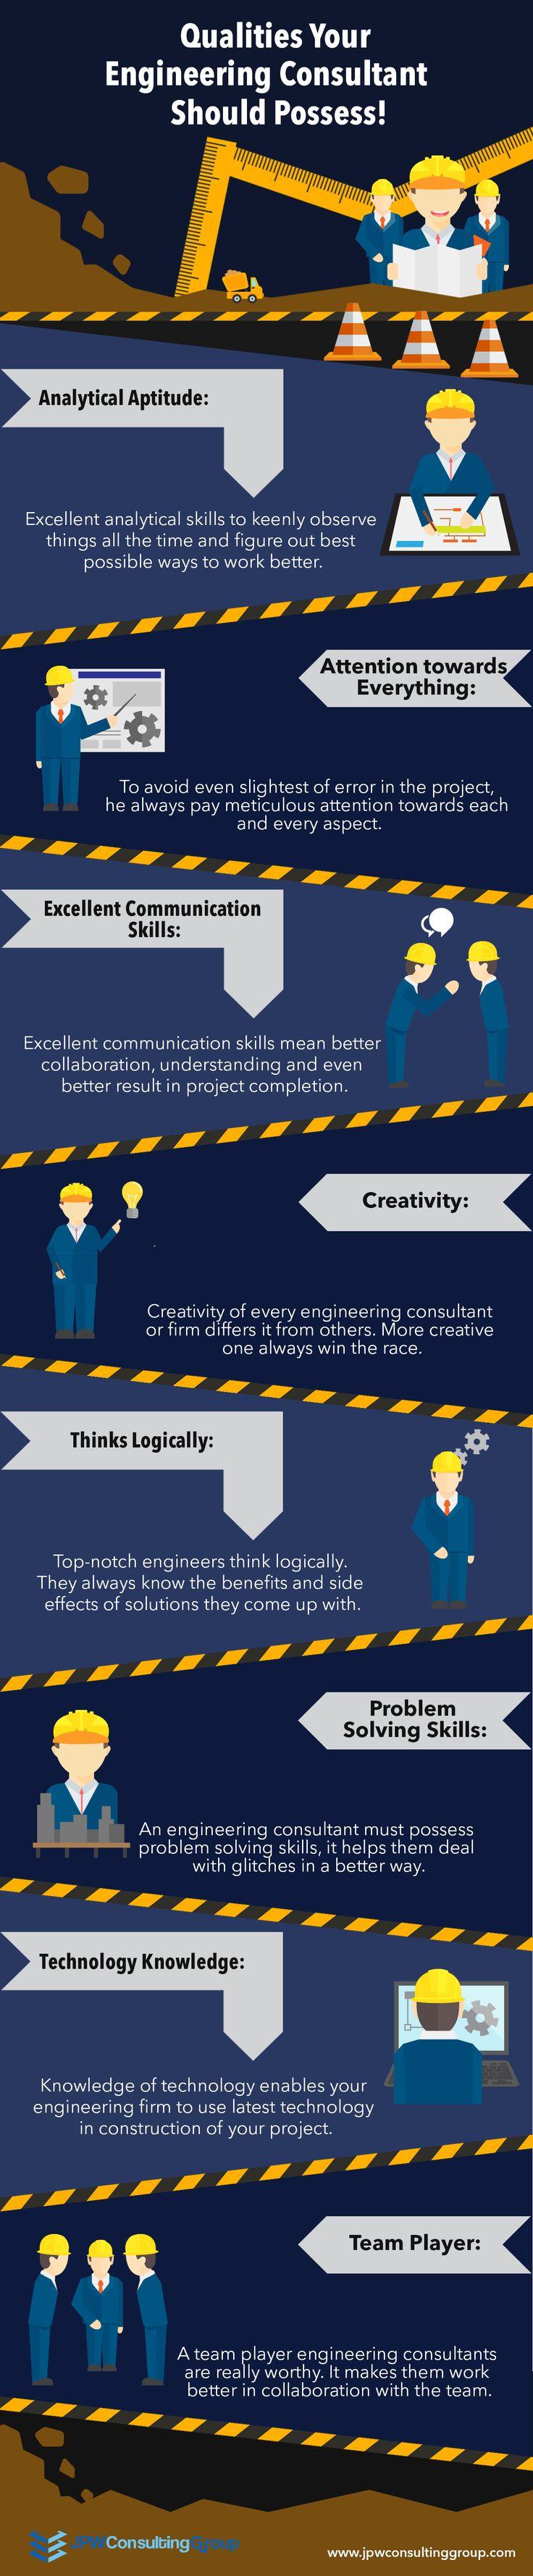 Qualities Your Engineering Consultant ShouldPossess!